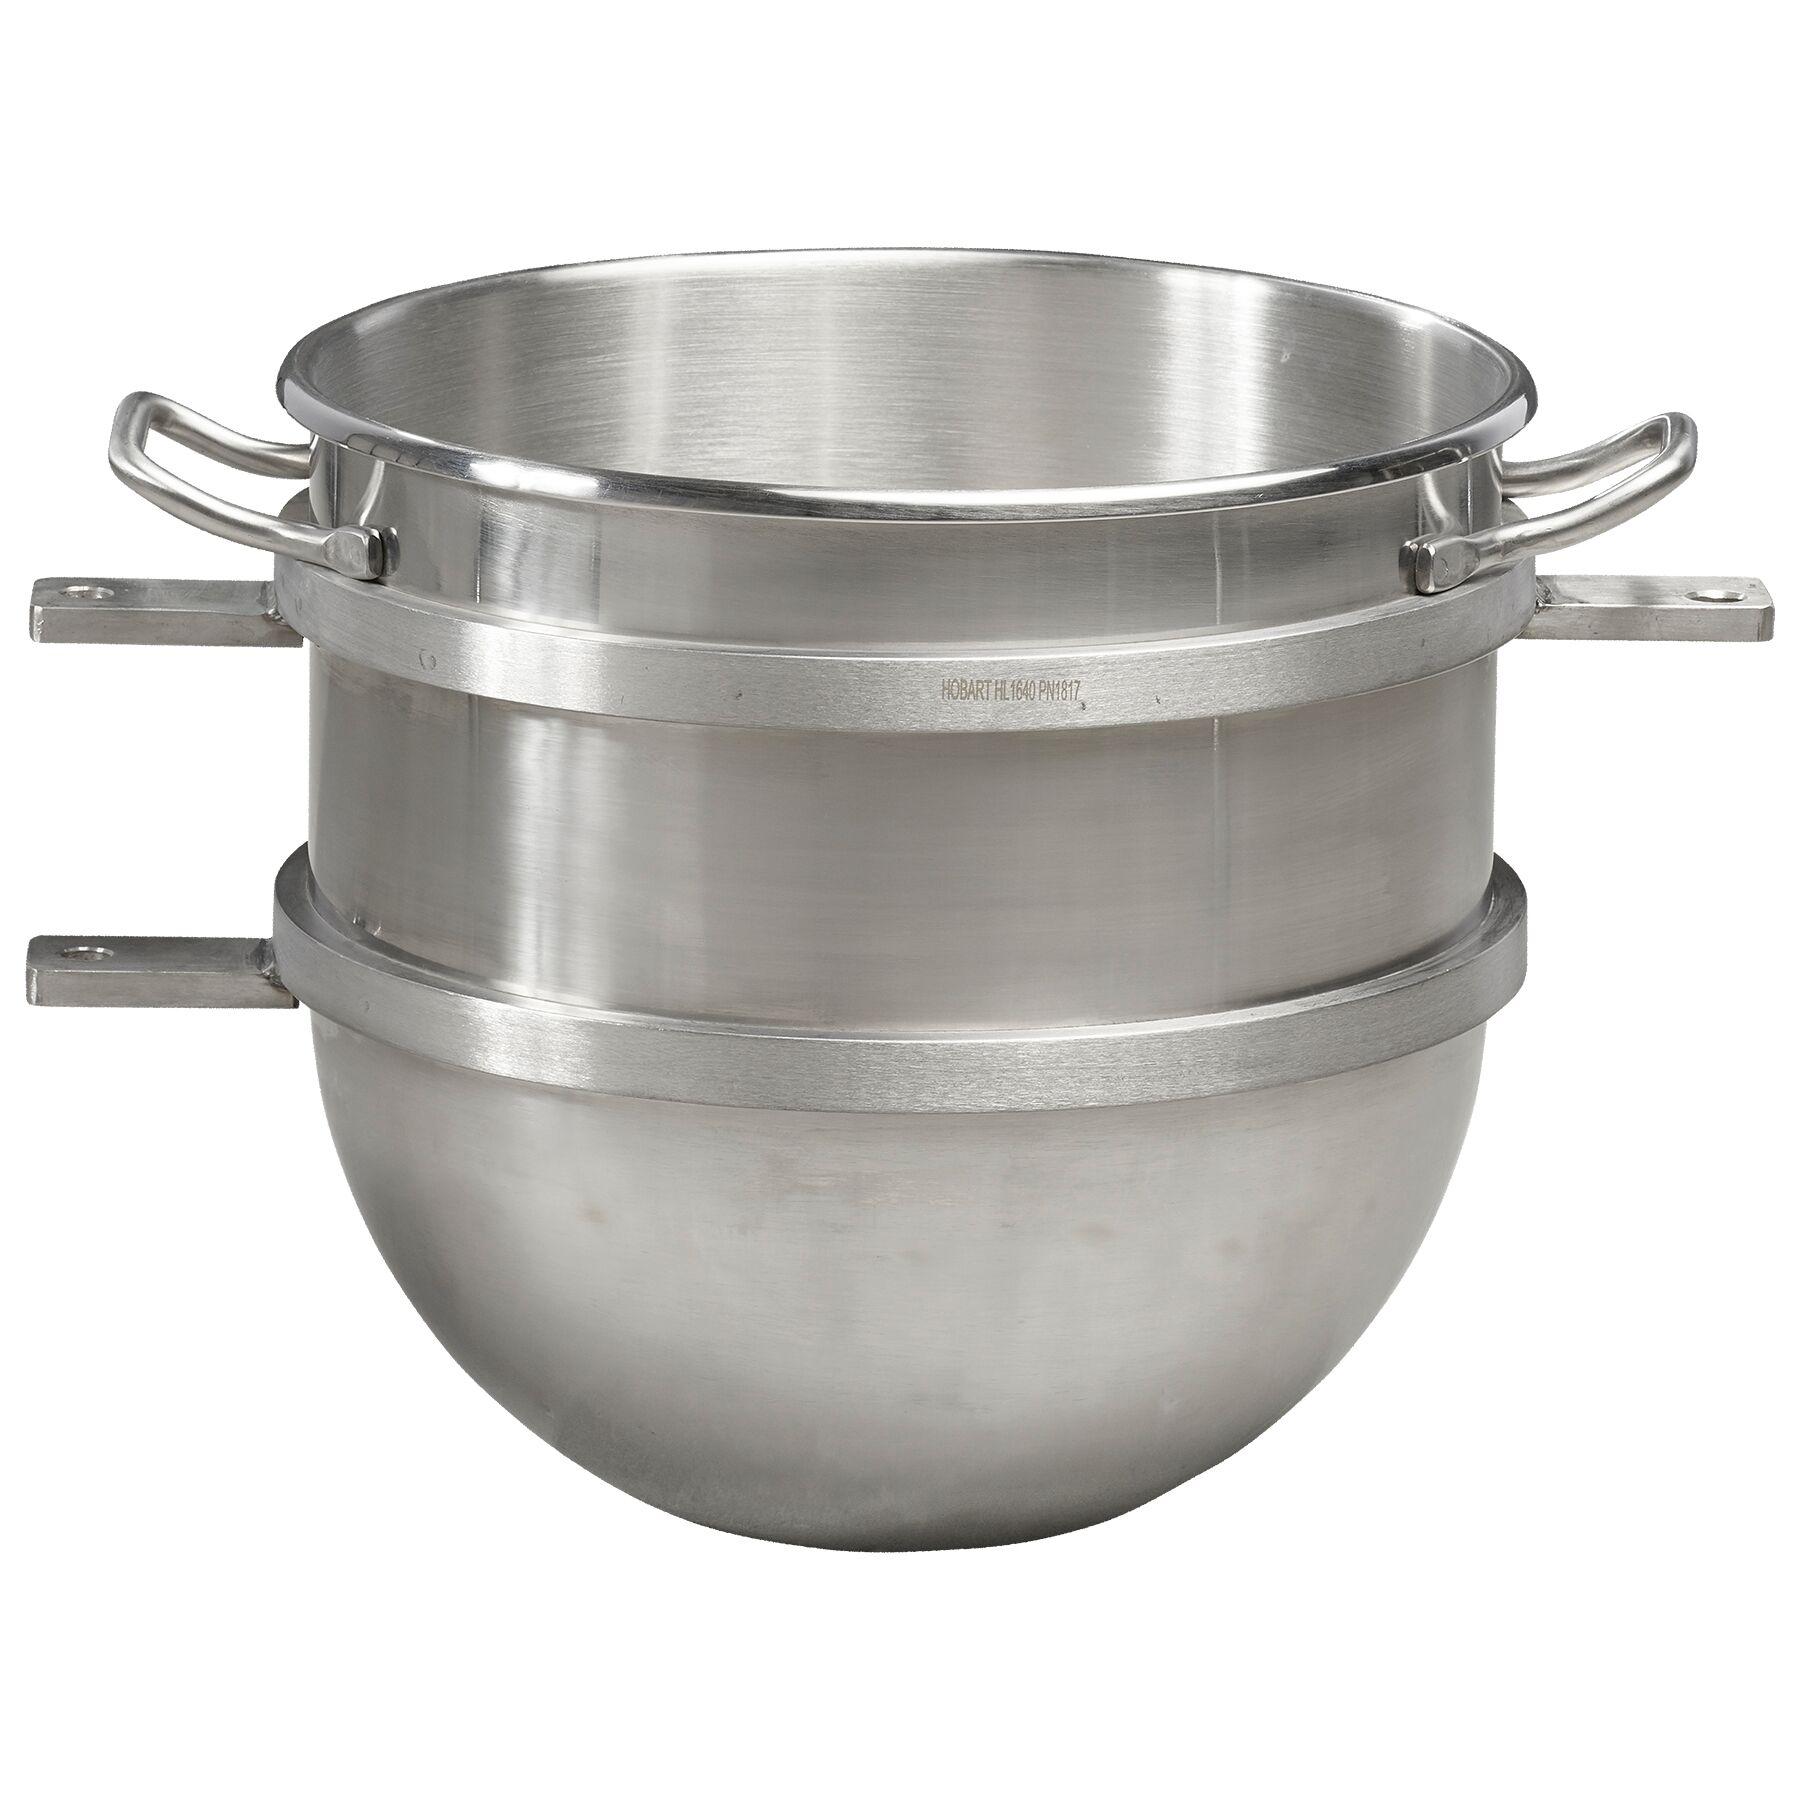 Hobart BOWL-HL40 mixer bowl